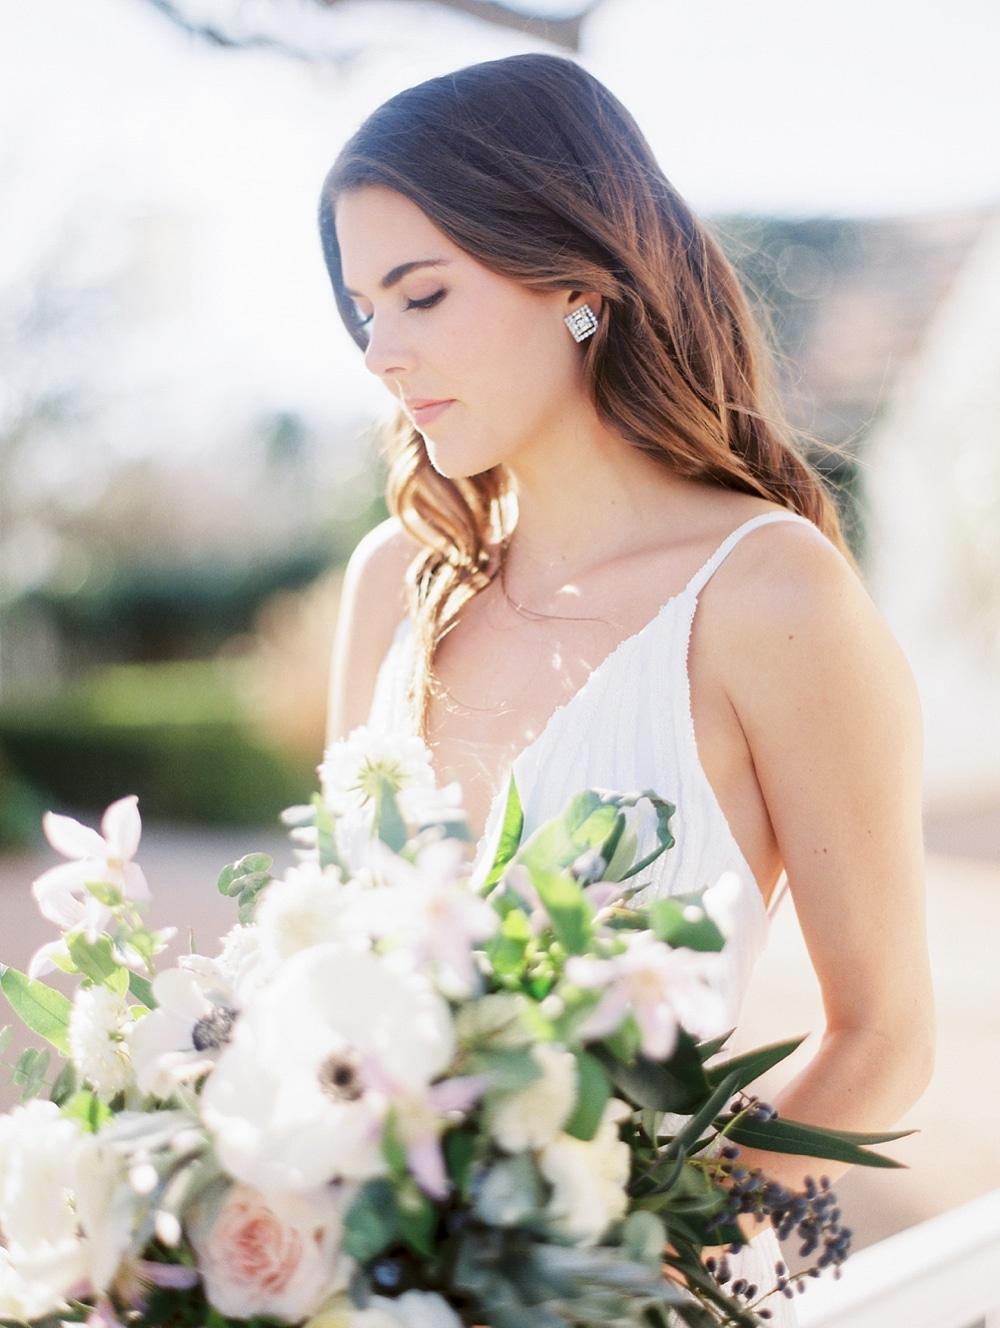 Kristin-La-Voie-Photography-Austin-Wedding-Photographer-barr-mansion (16 of 86)